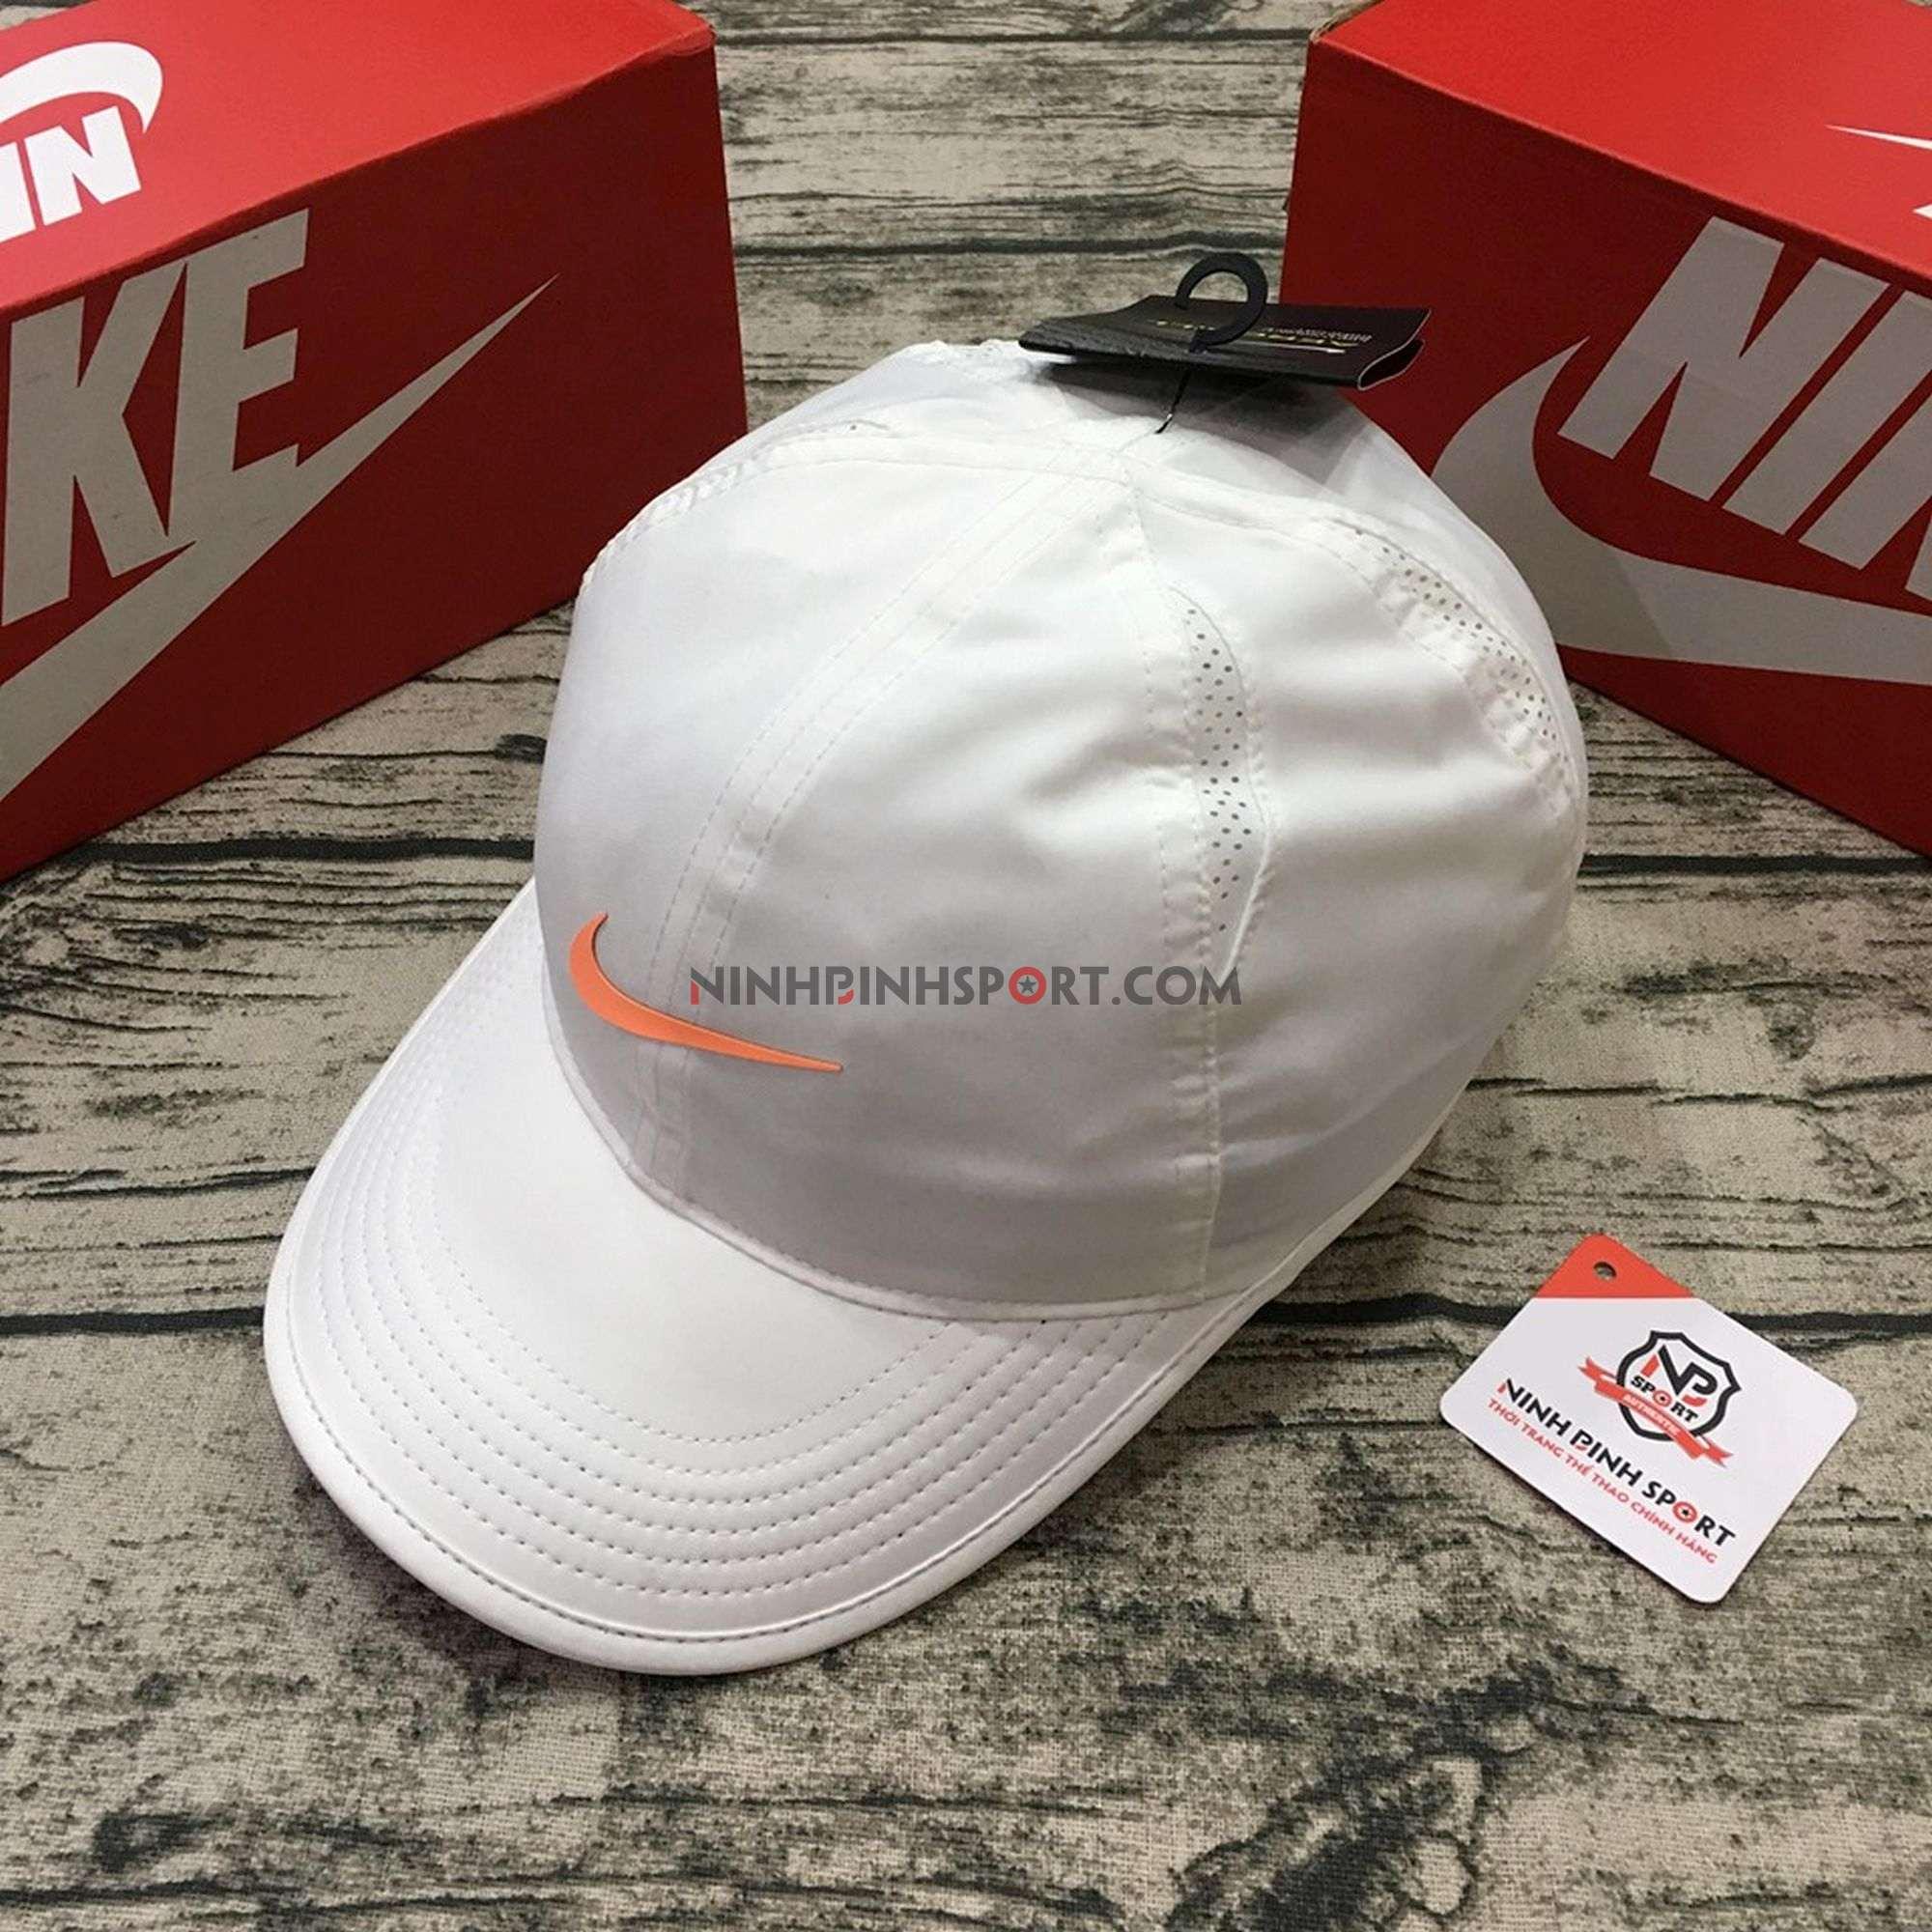 Mũ thể thao nữ Nike Womens Featherlight 679424-133